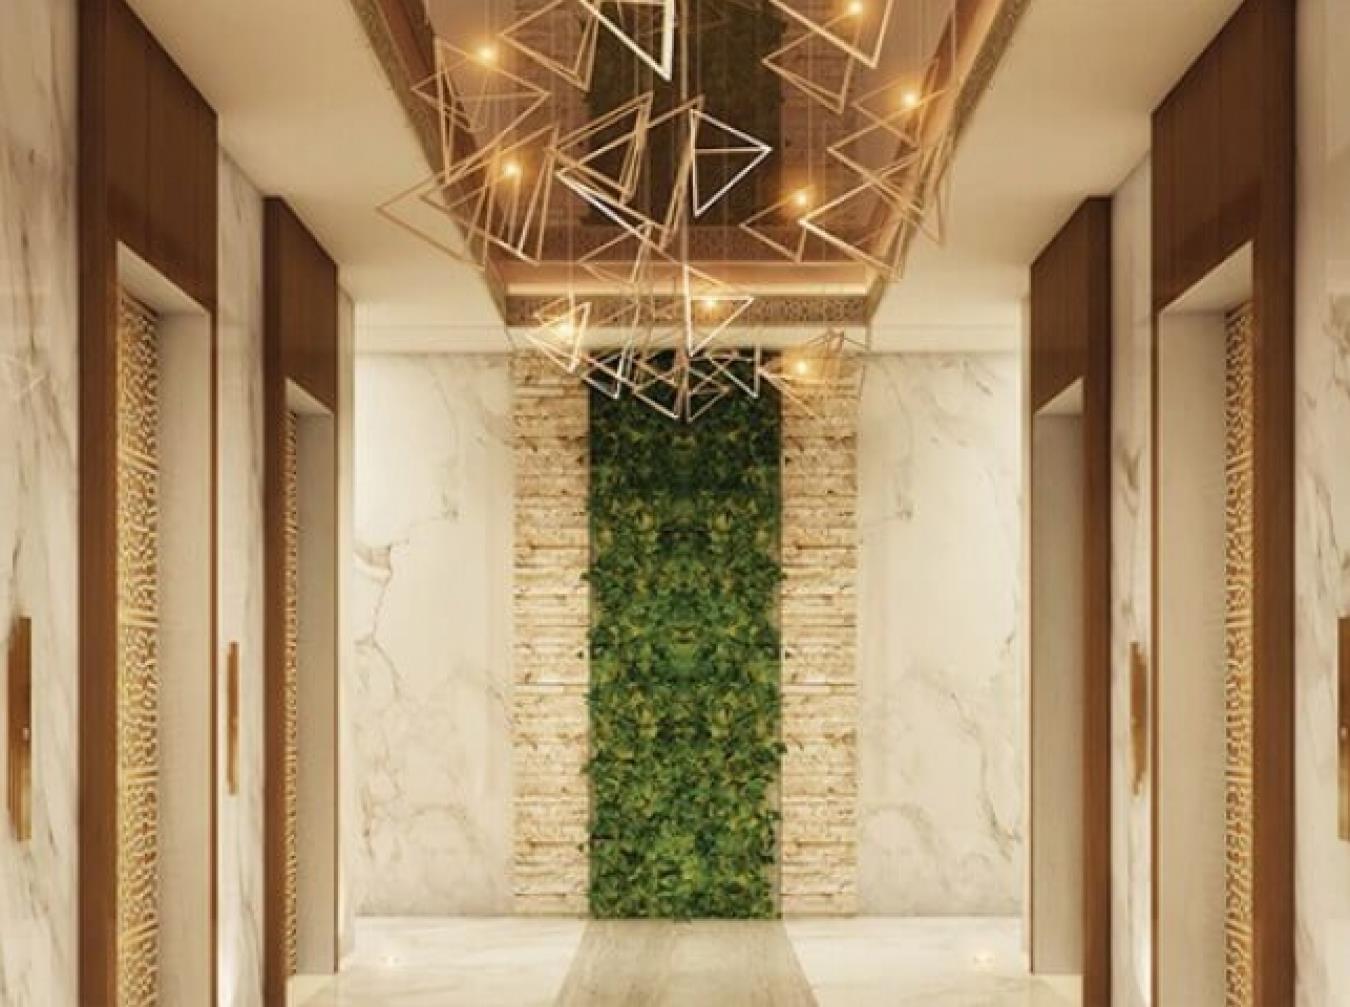 Exquisite 3 BR Apartment with Impressive BLVD View